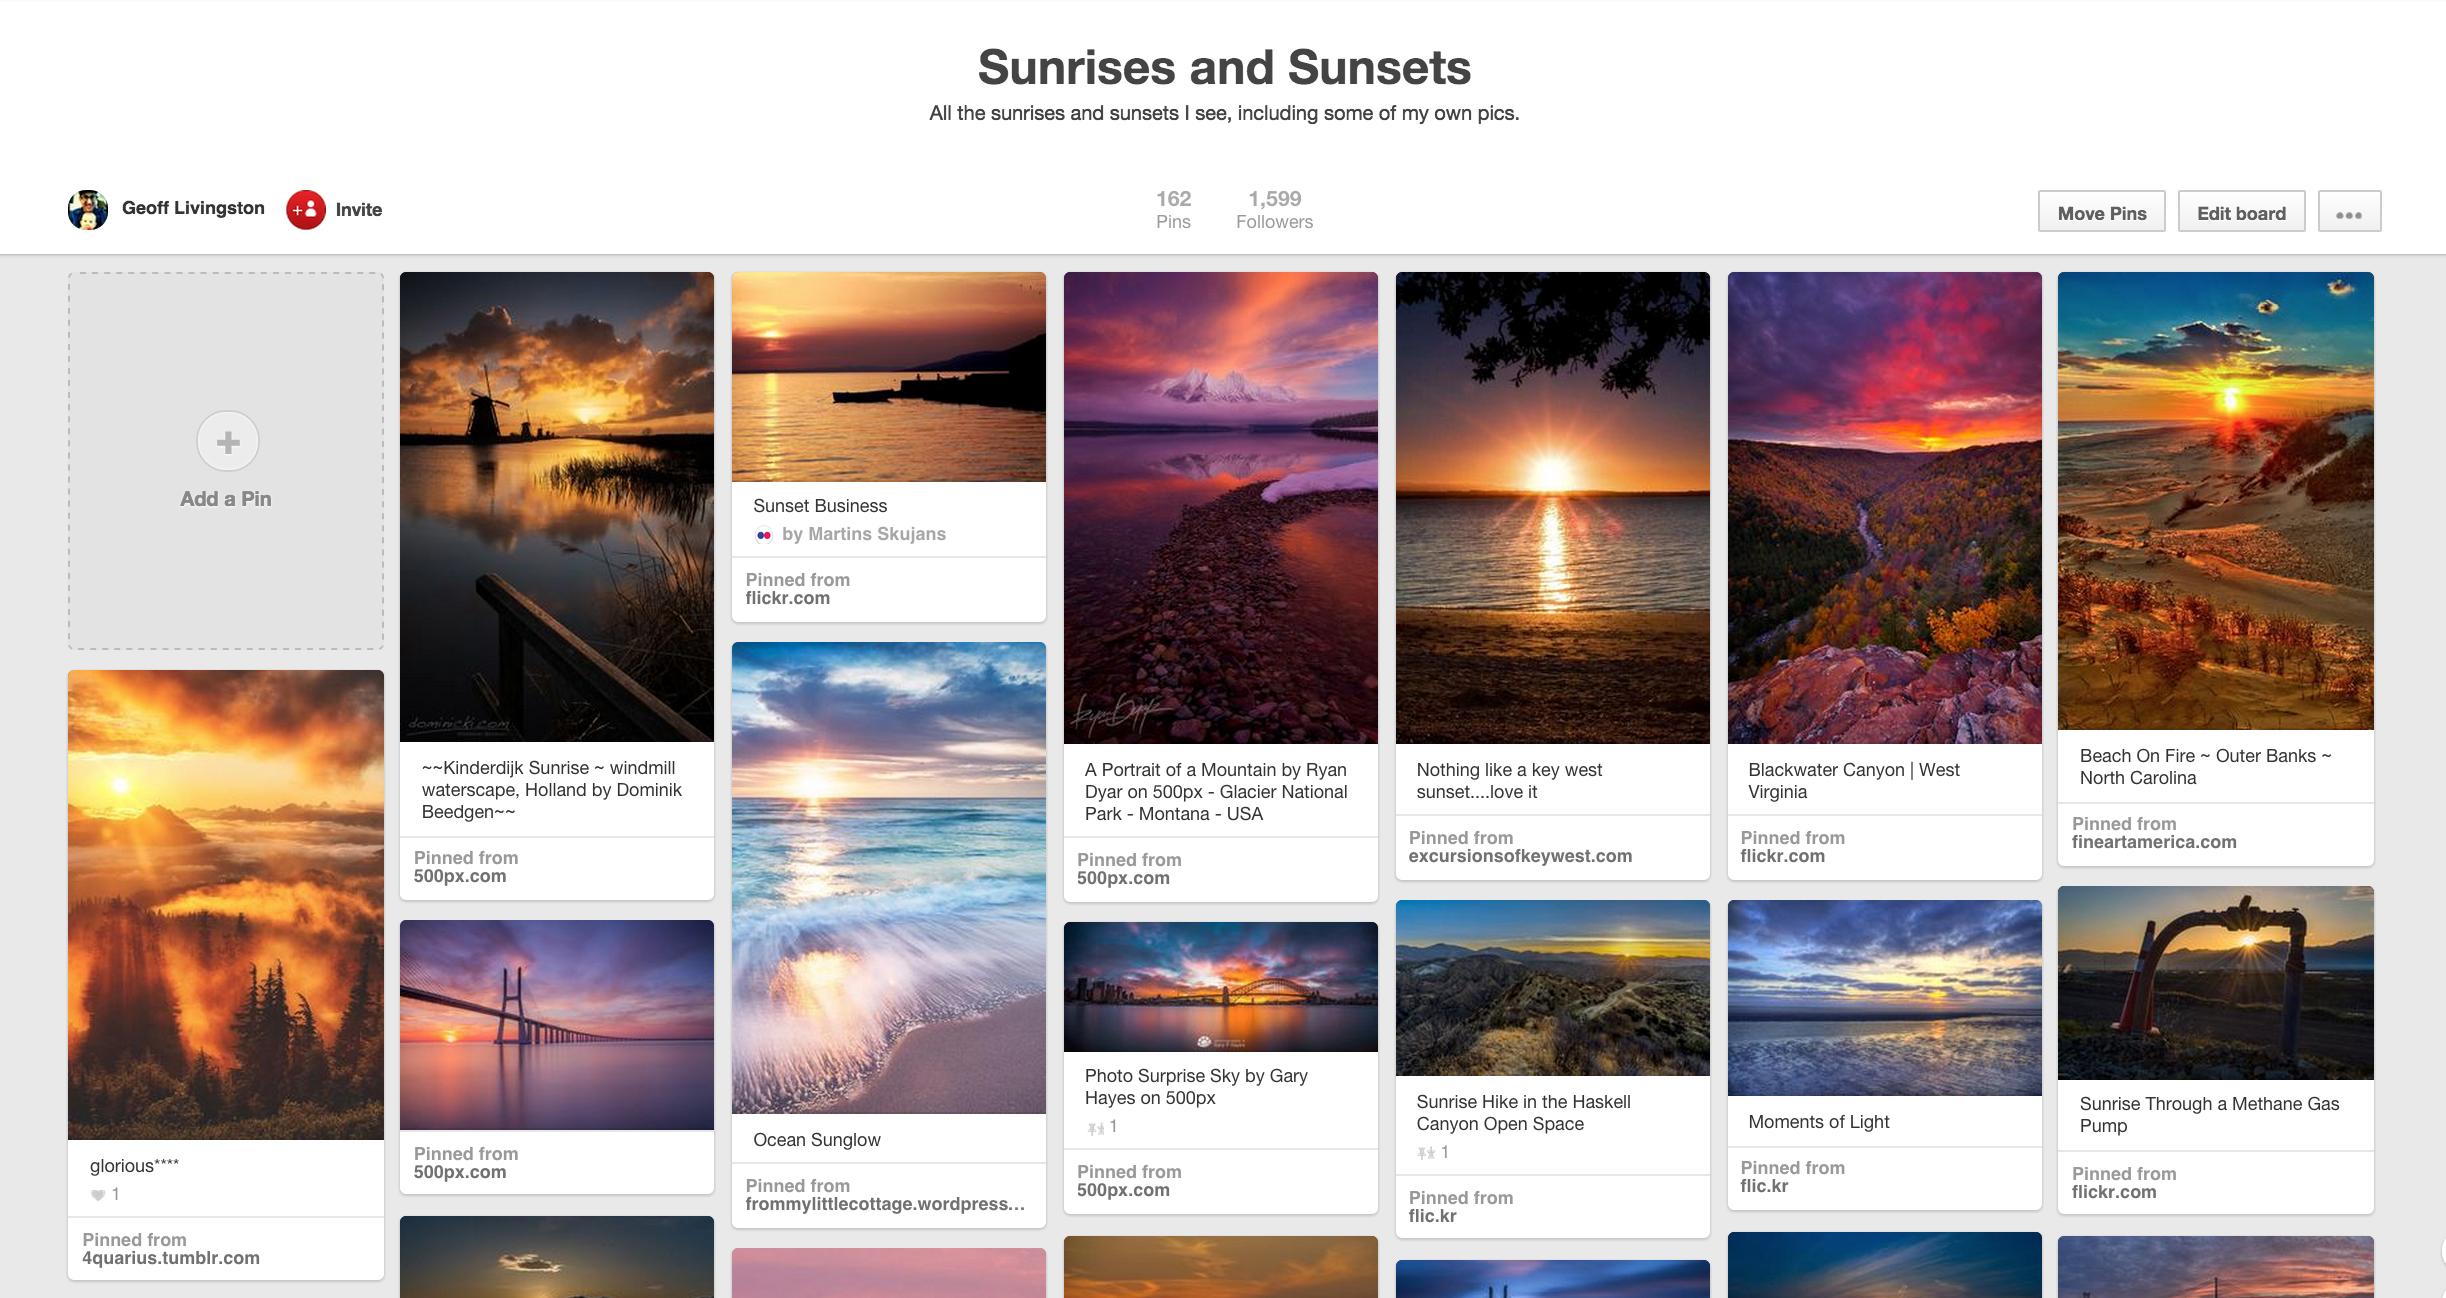 5 Ways Communication on Pinterest Differs